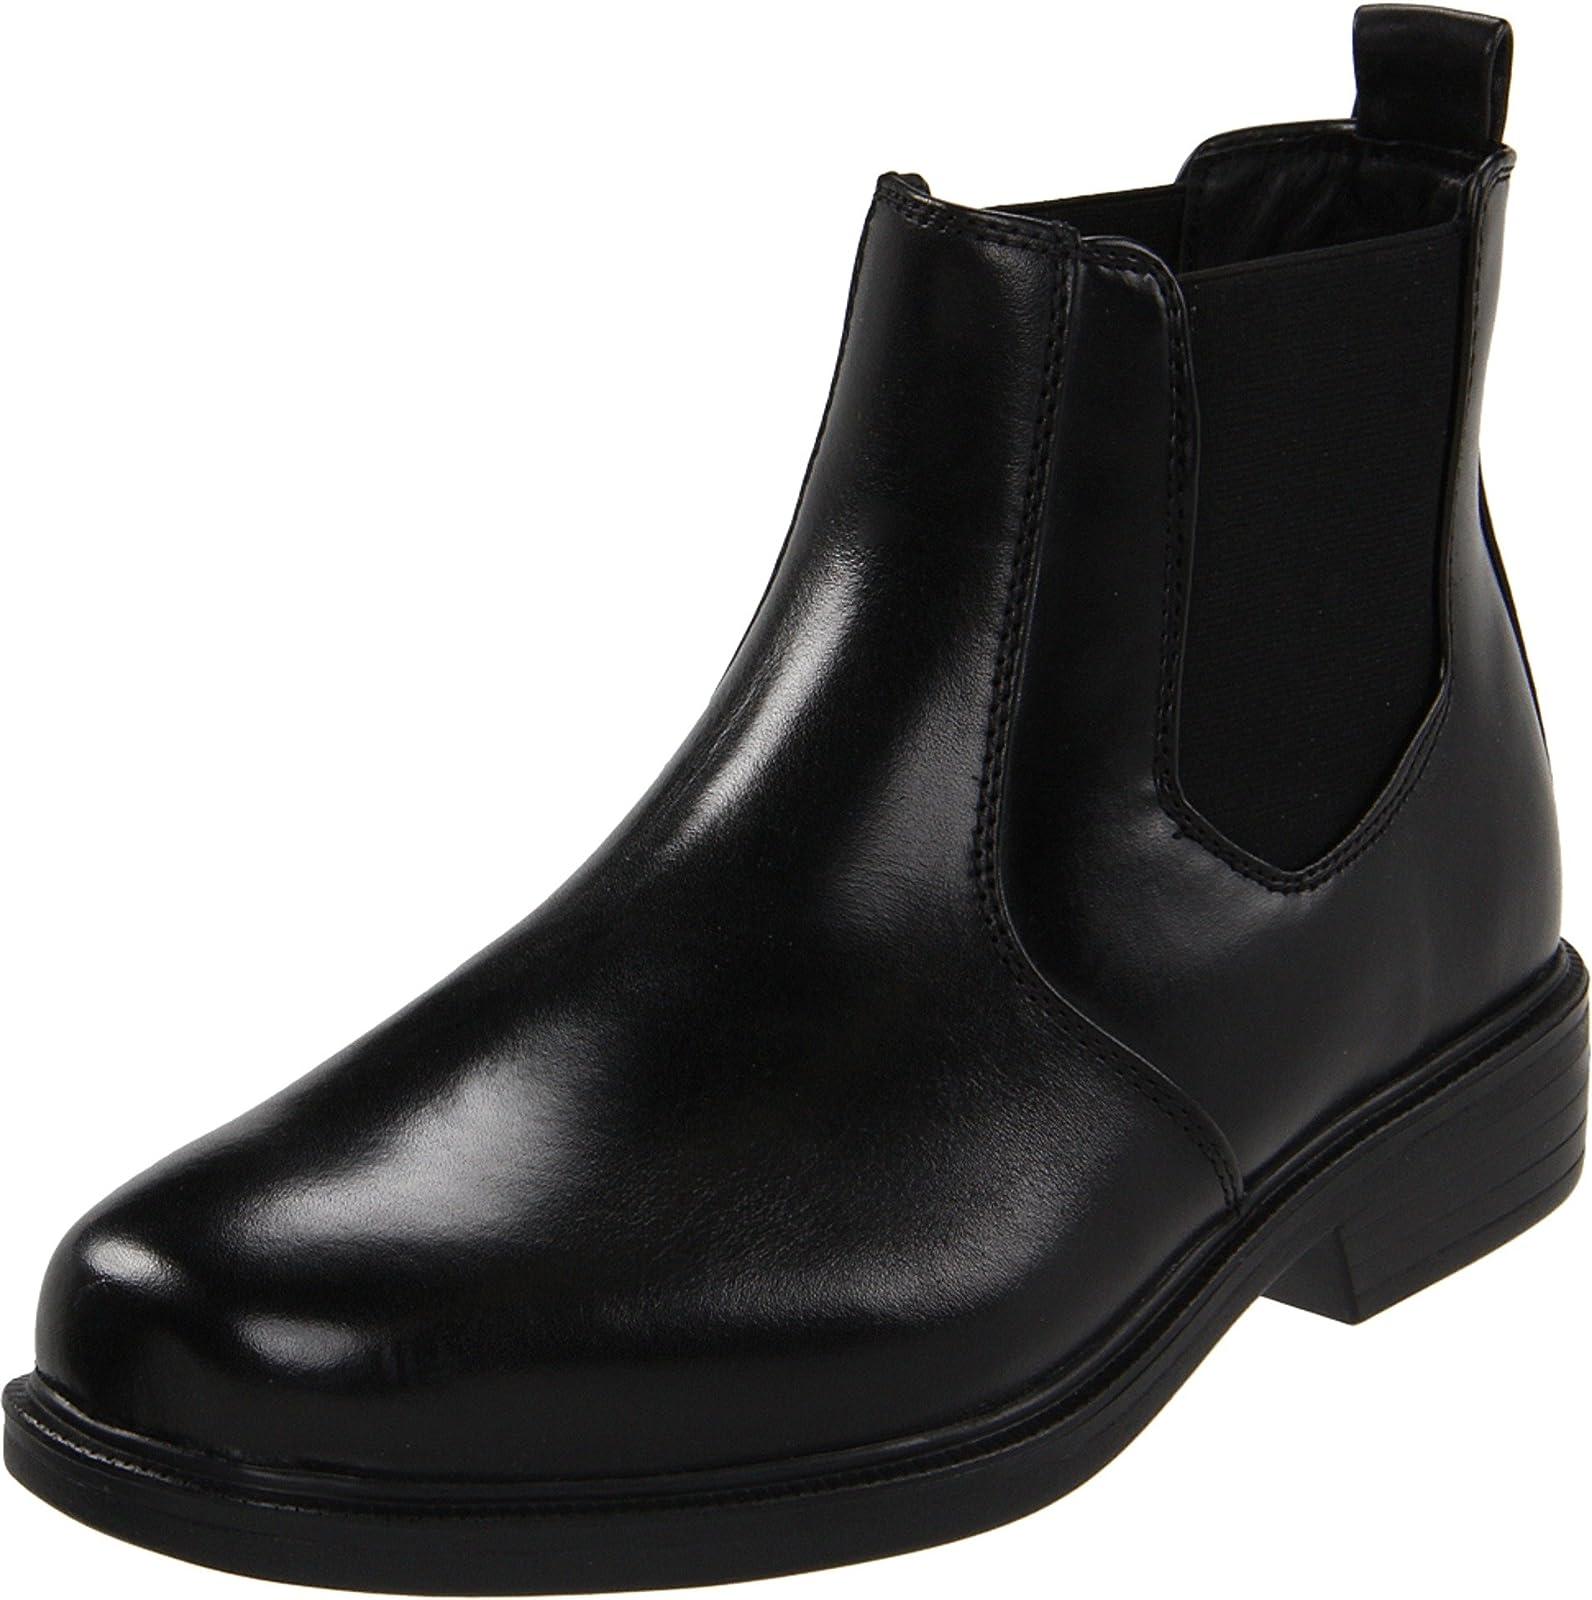 Giorgio Brutini Men's Chelsea Dress Boot Cormac Black - 1